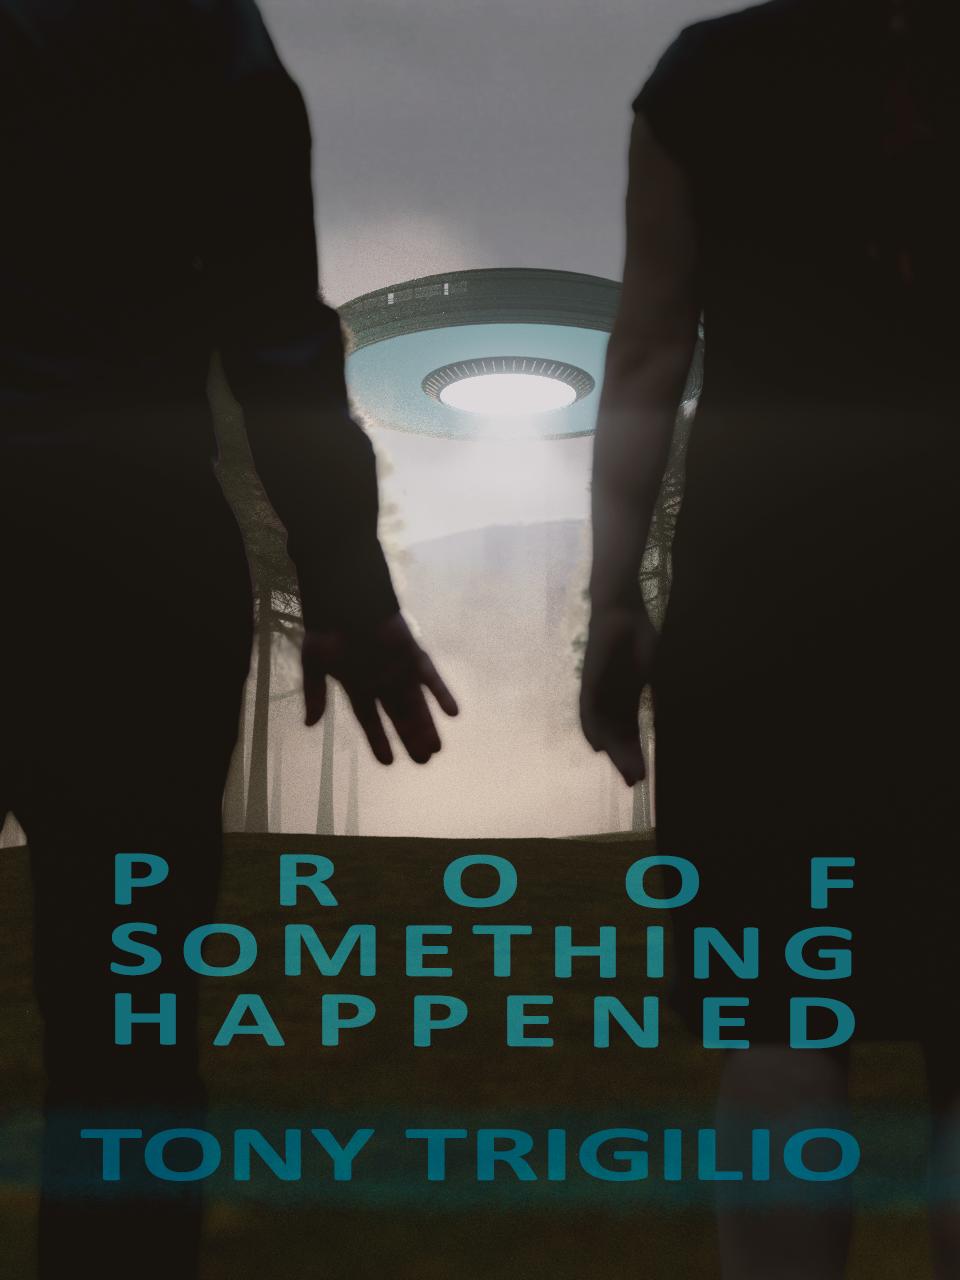 Tony Trigilio: Proof Something Happened